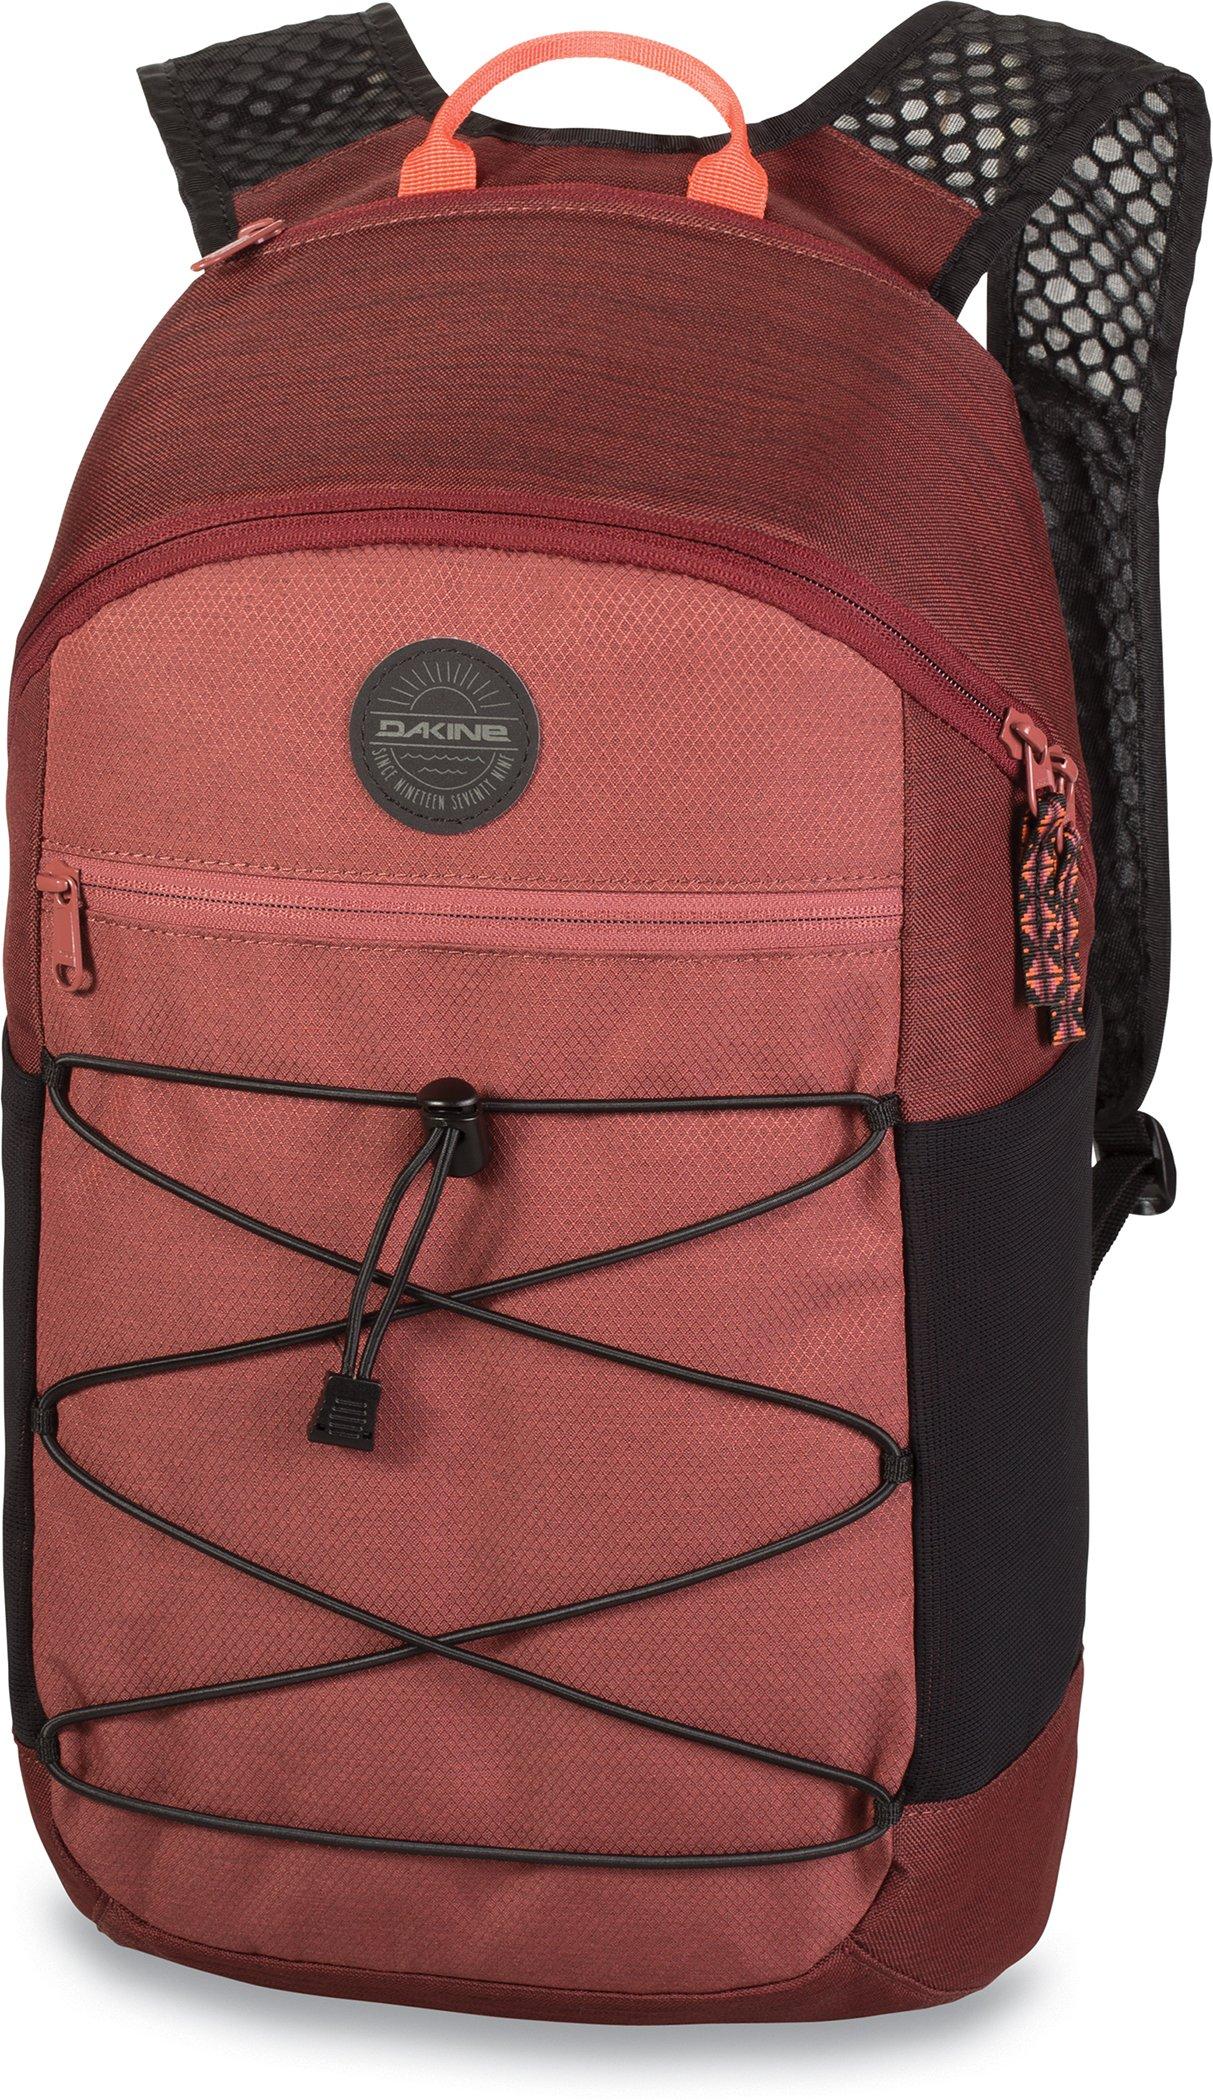 Dakine Wonder Sport Backpack, 18l, Burnt Rose by Dakine